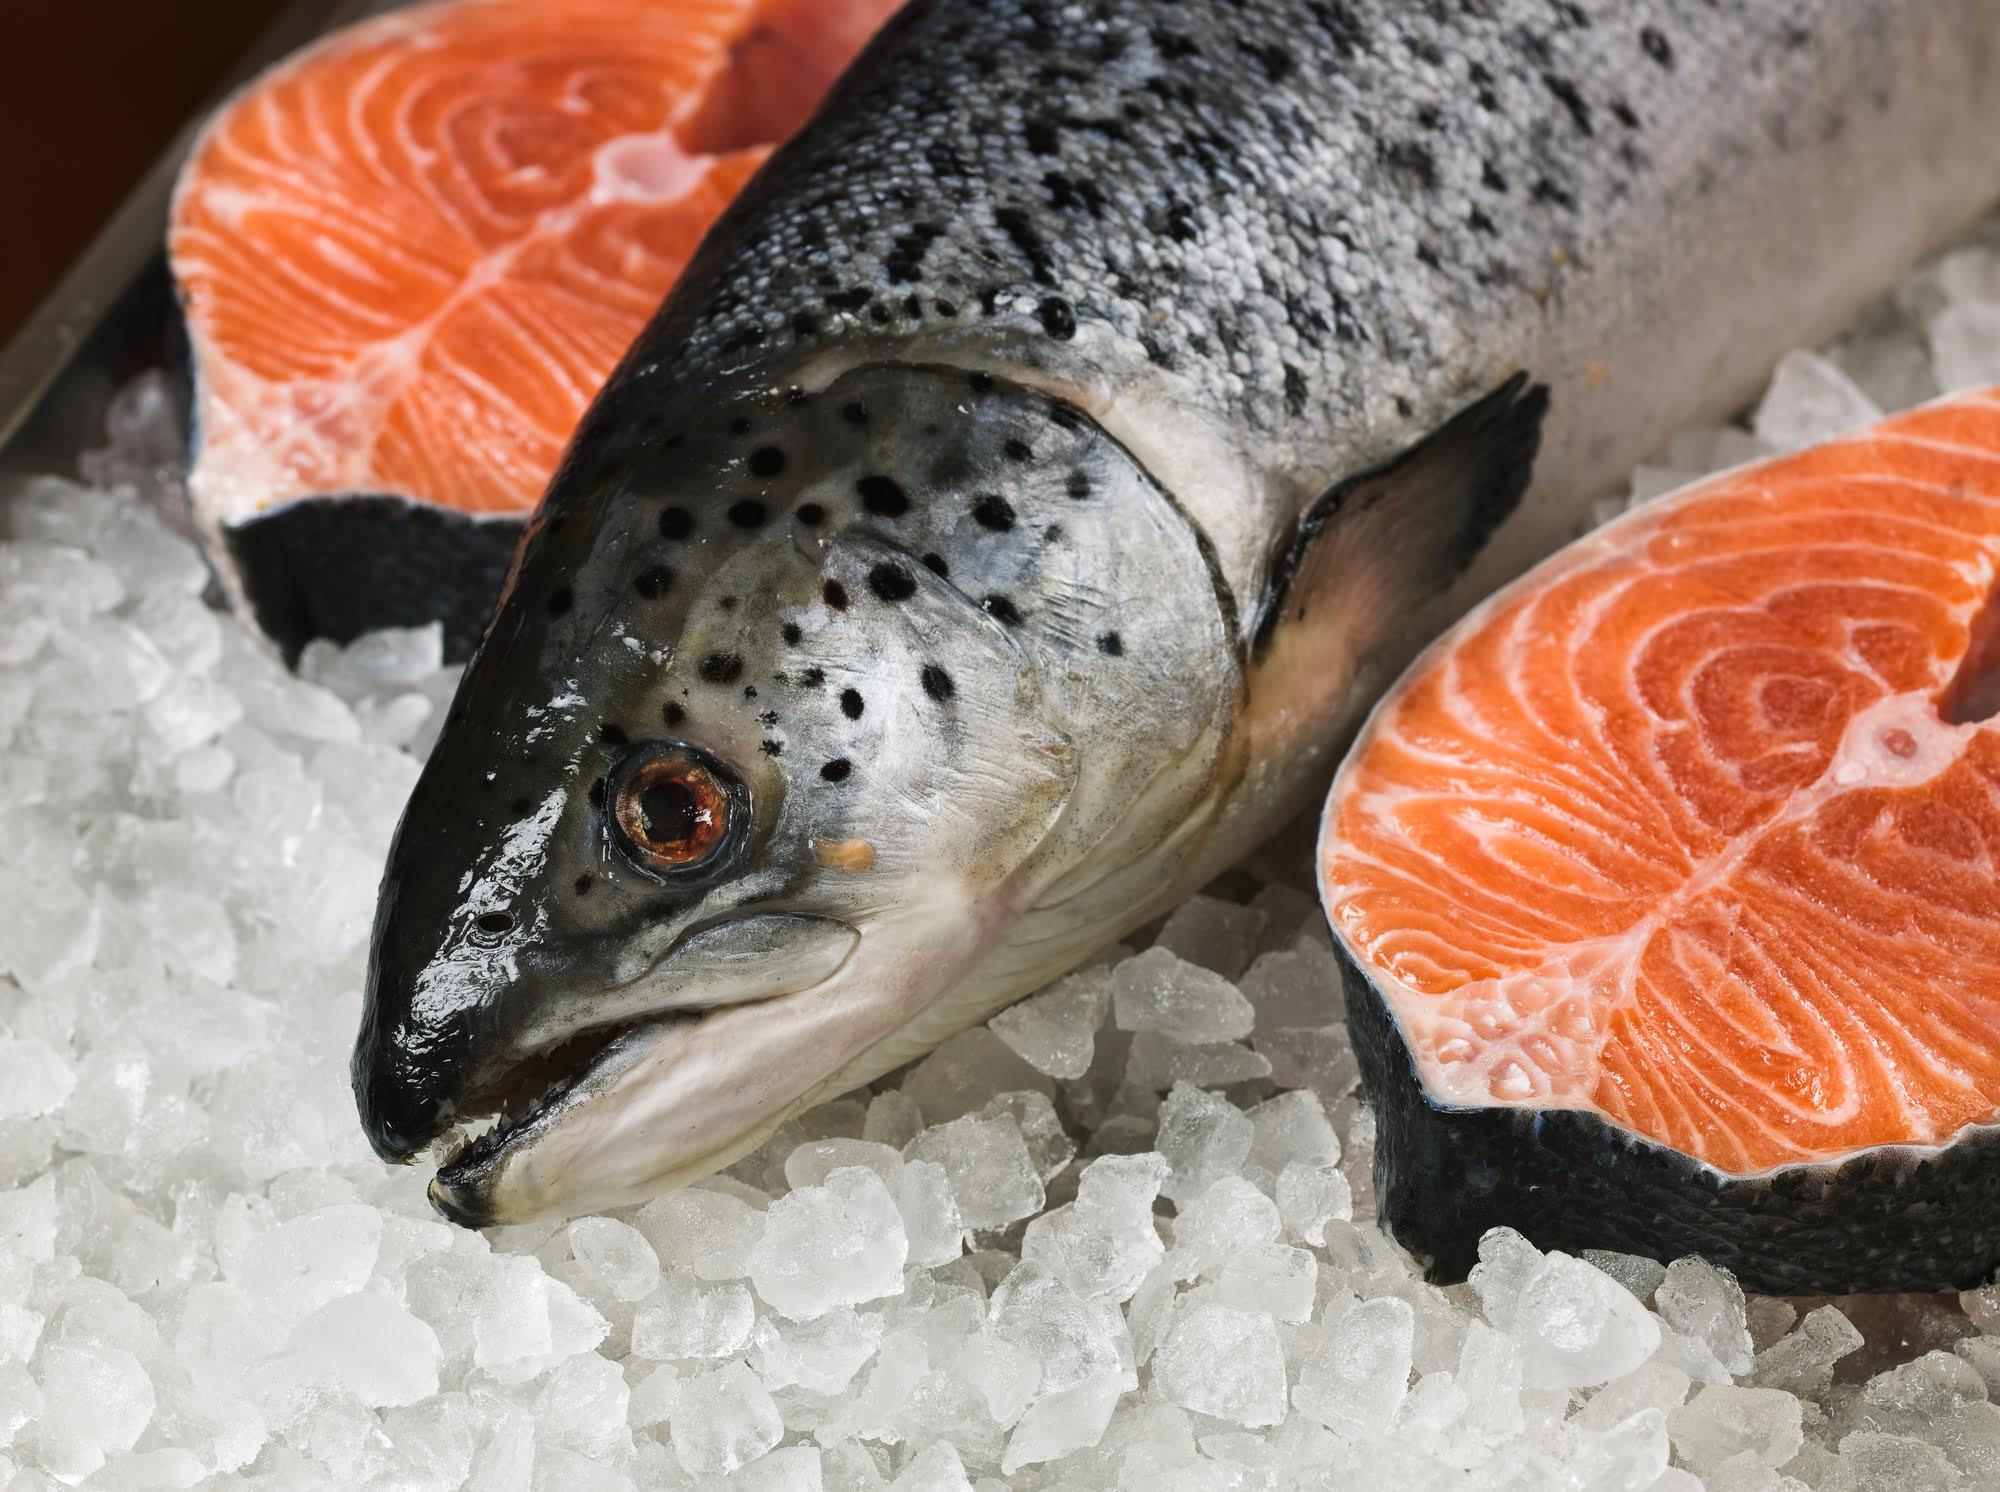 Fresh atlantic salmon on ice